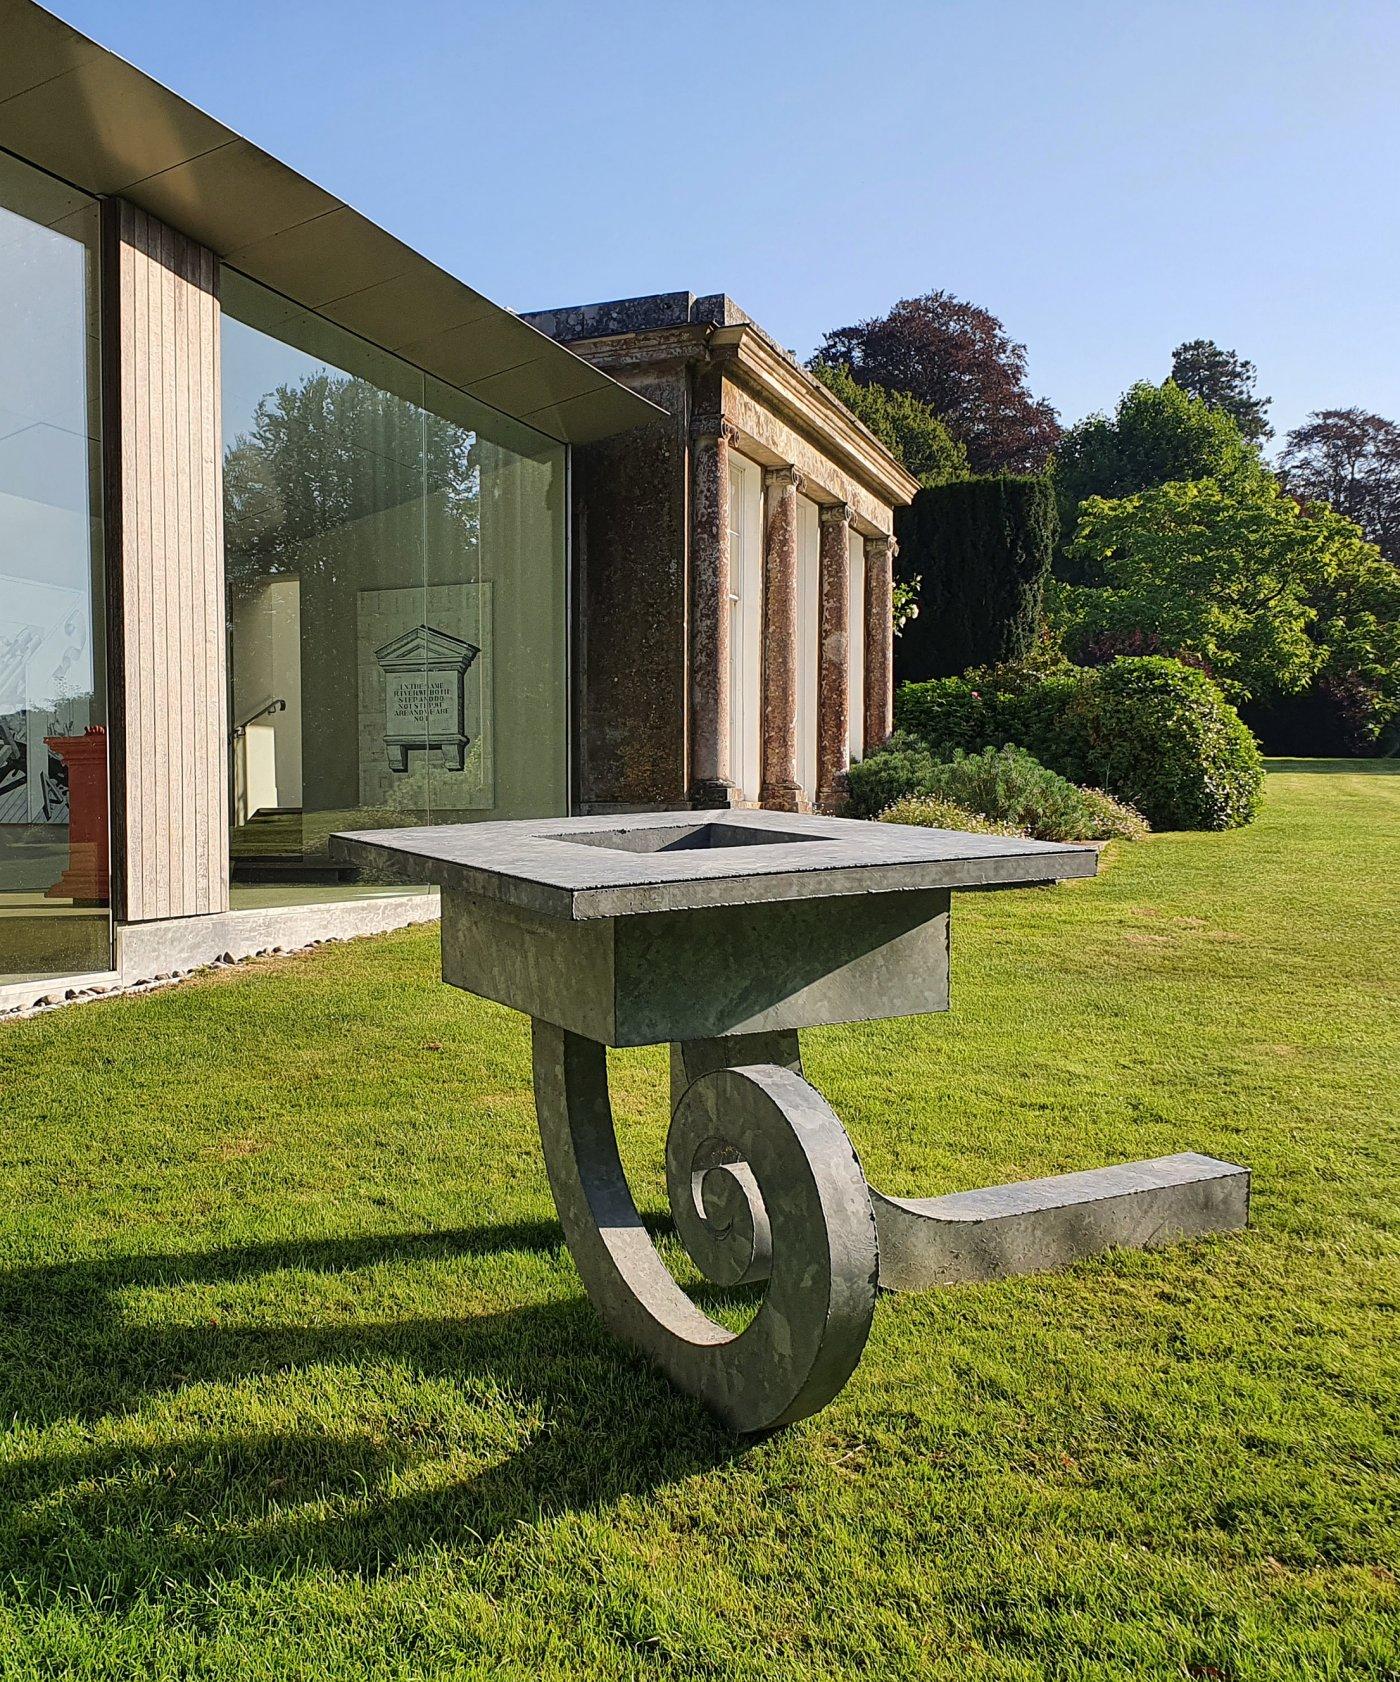 New Art Centre Edward Allington Nika Neelova 6